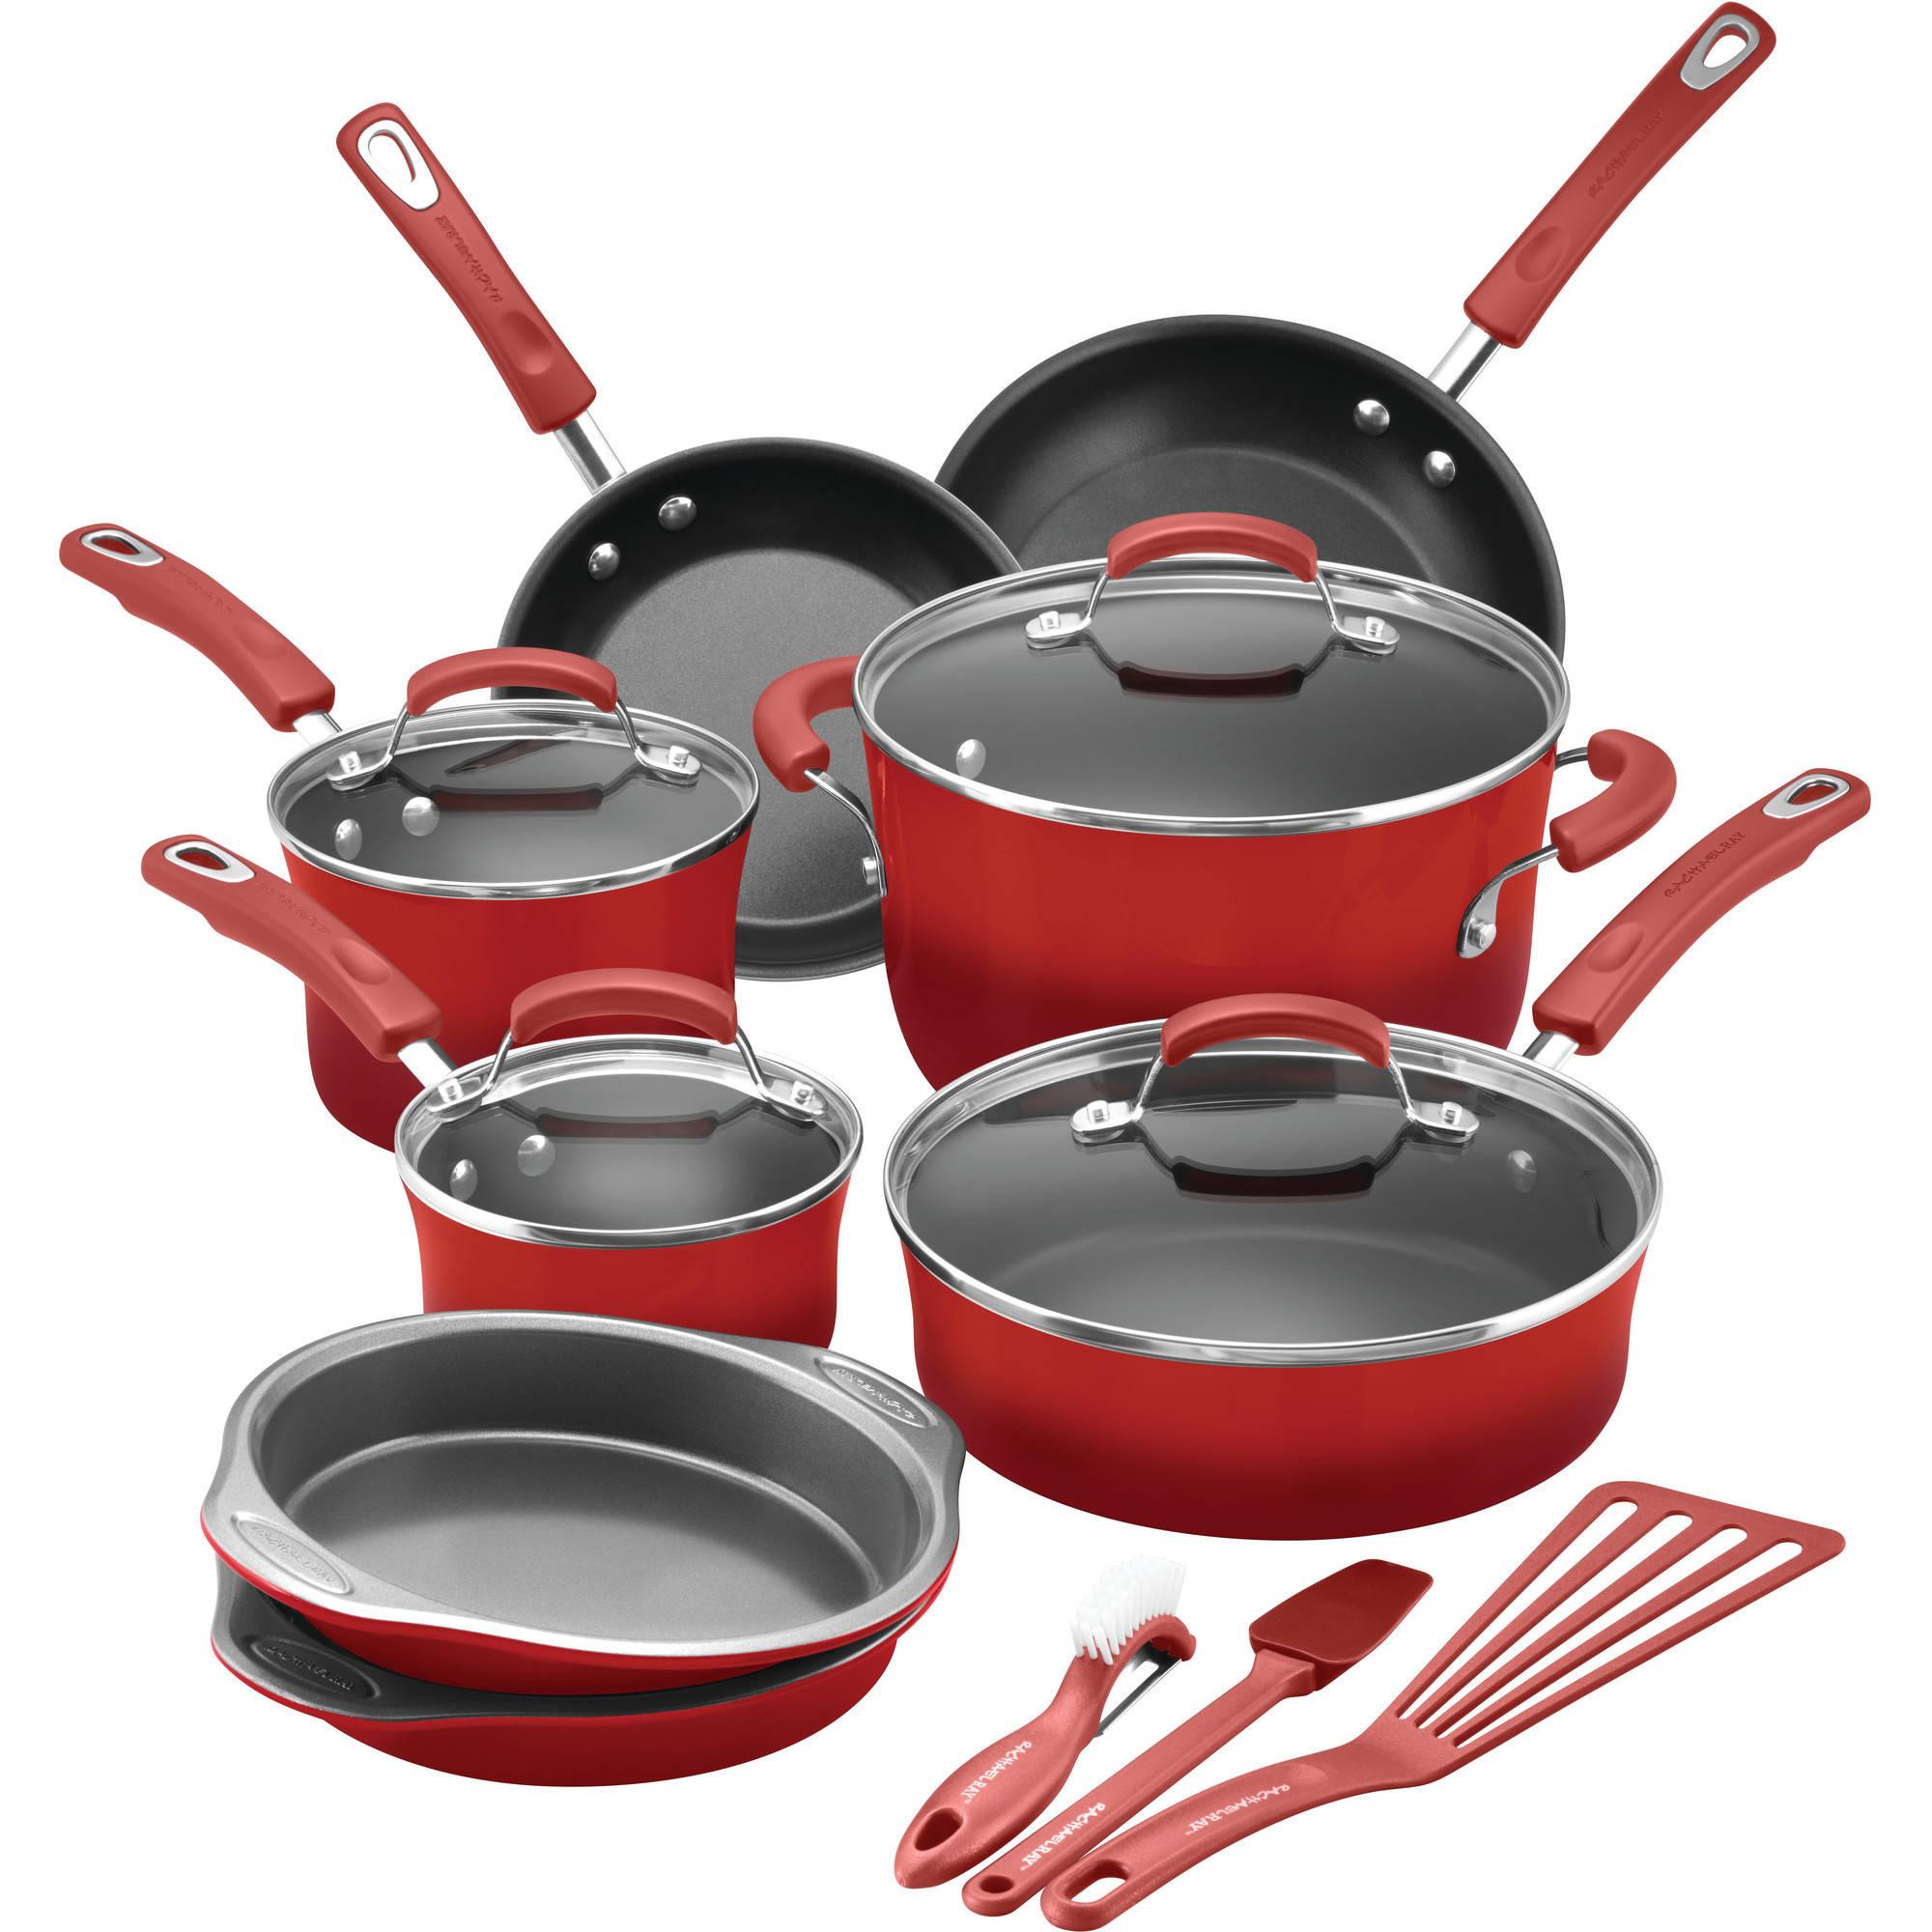 Rachael Ray 15-Piece Hard Enamel Nonstick Cookware Set